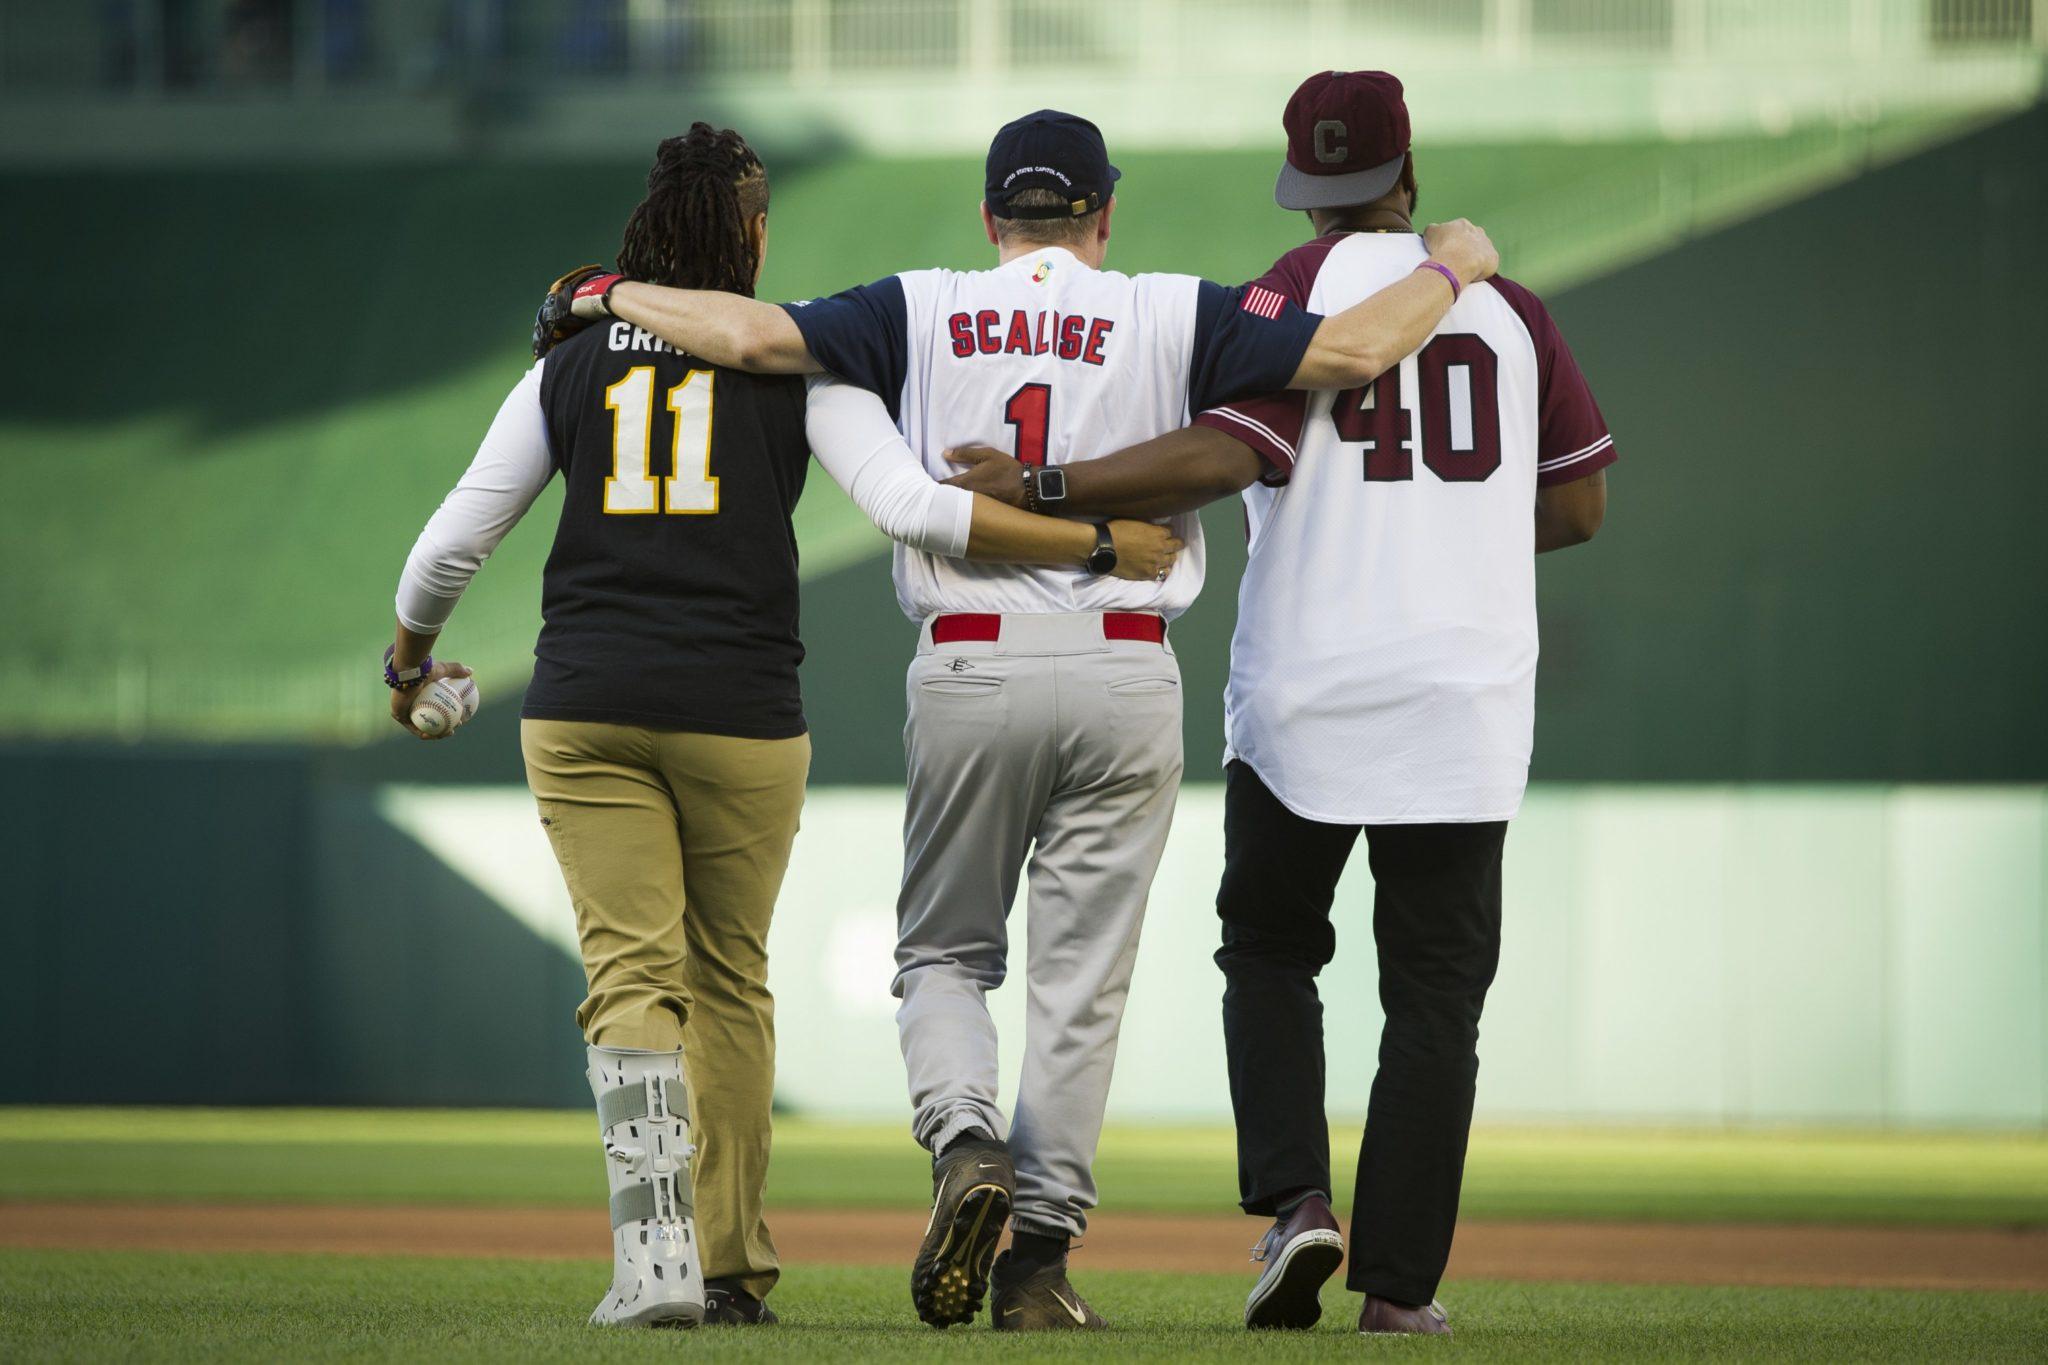 Congressional Baseball Game Scalise